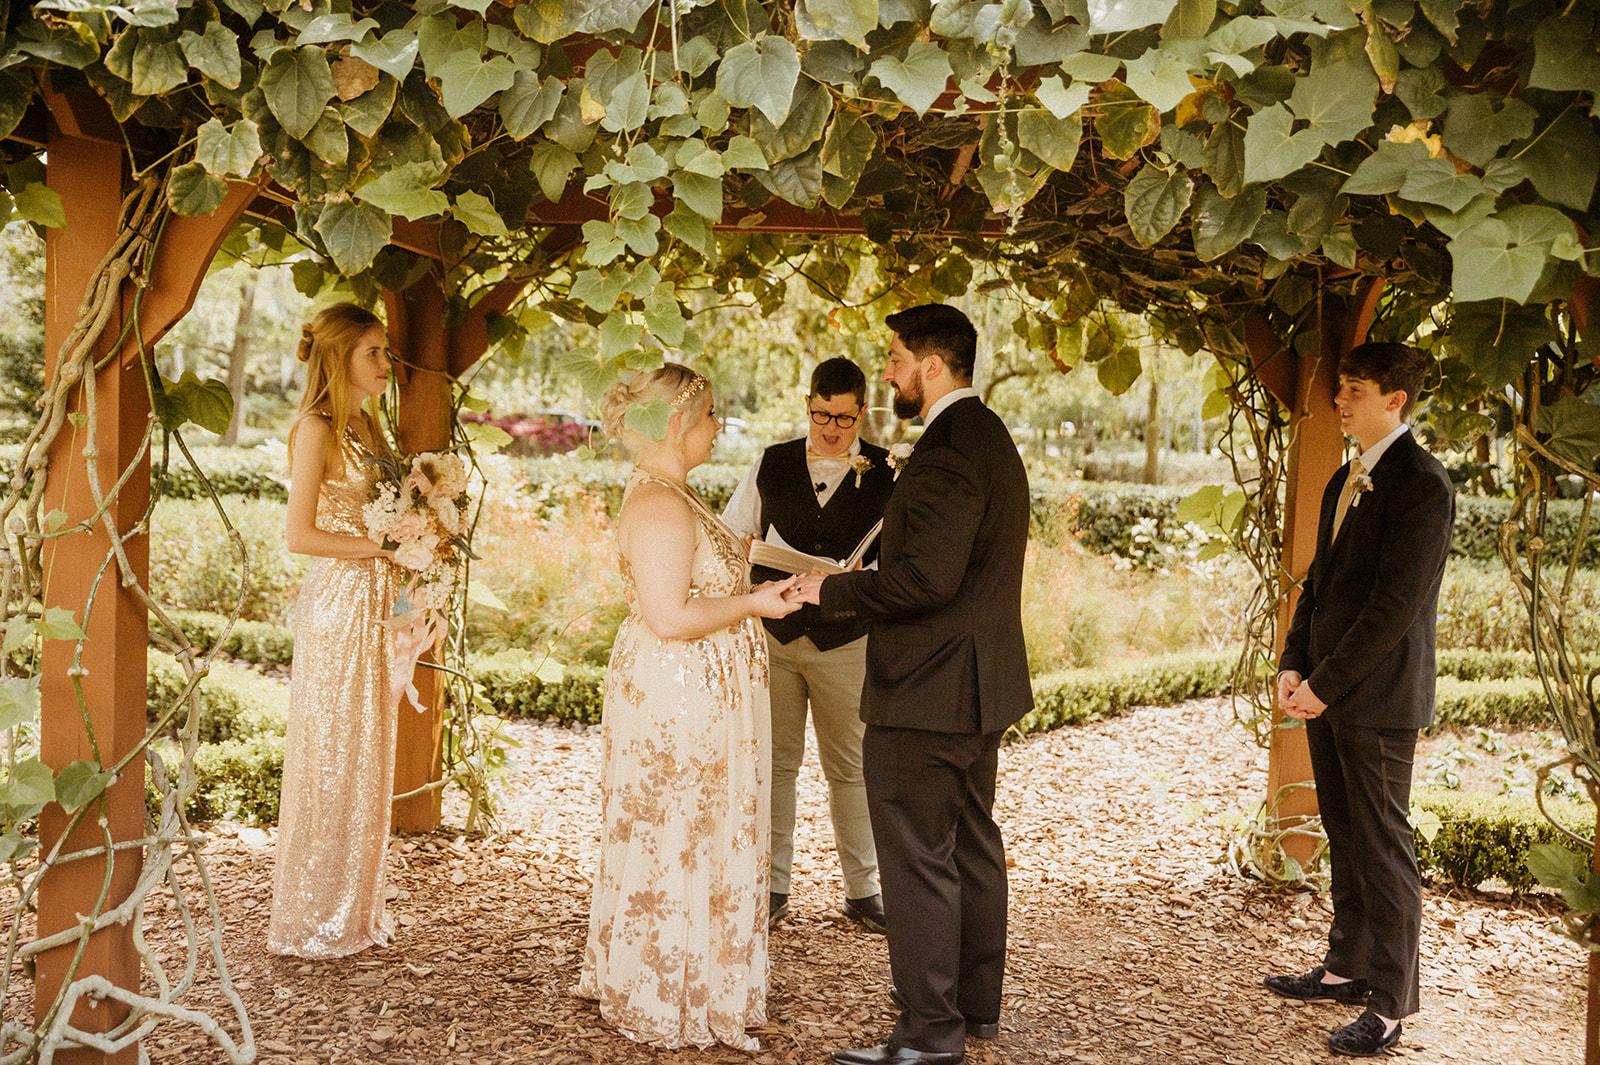 Orlando Garden Wedding | Leah and Logan at the Hard Rock Hotel